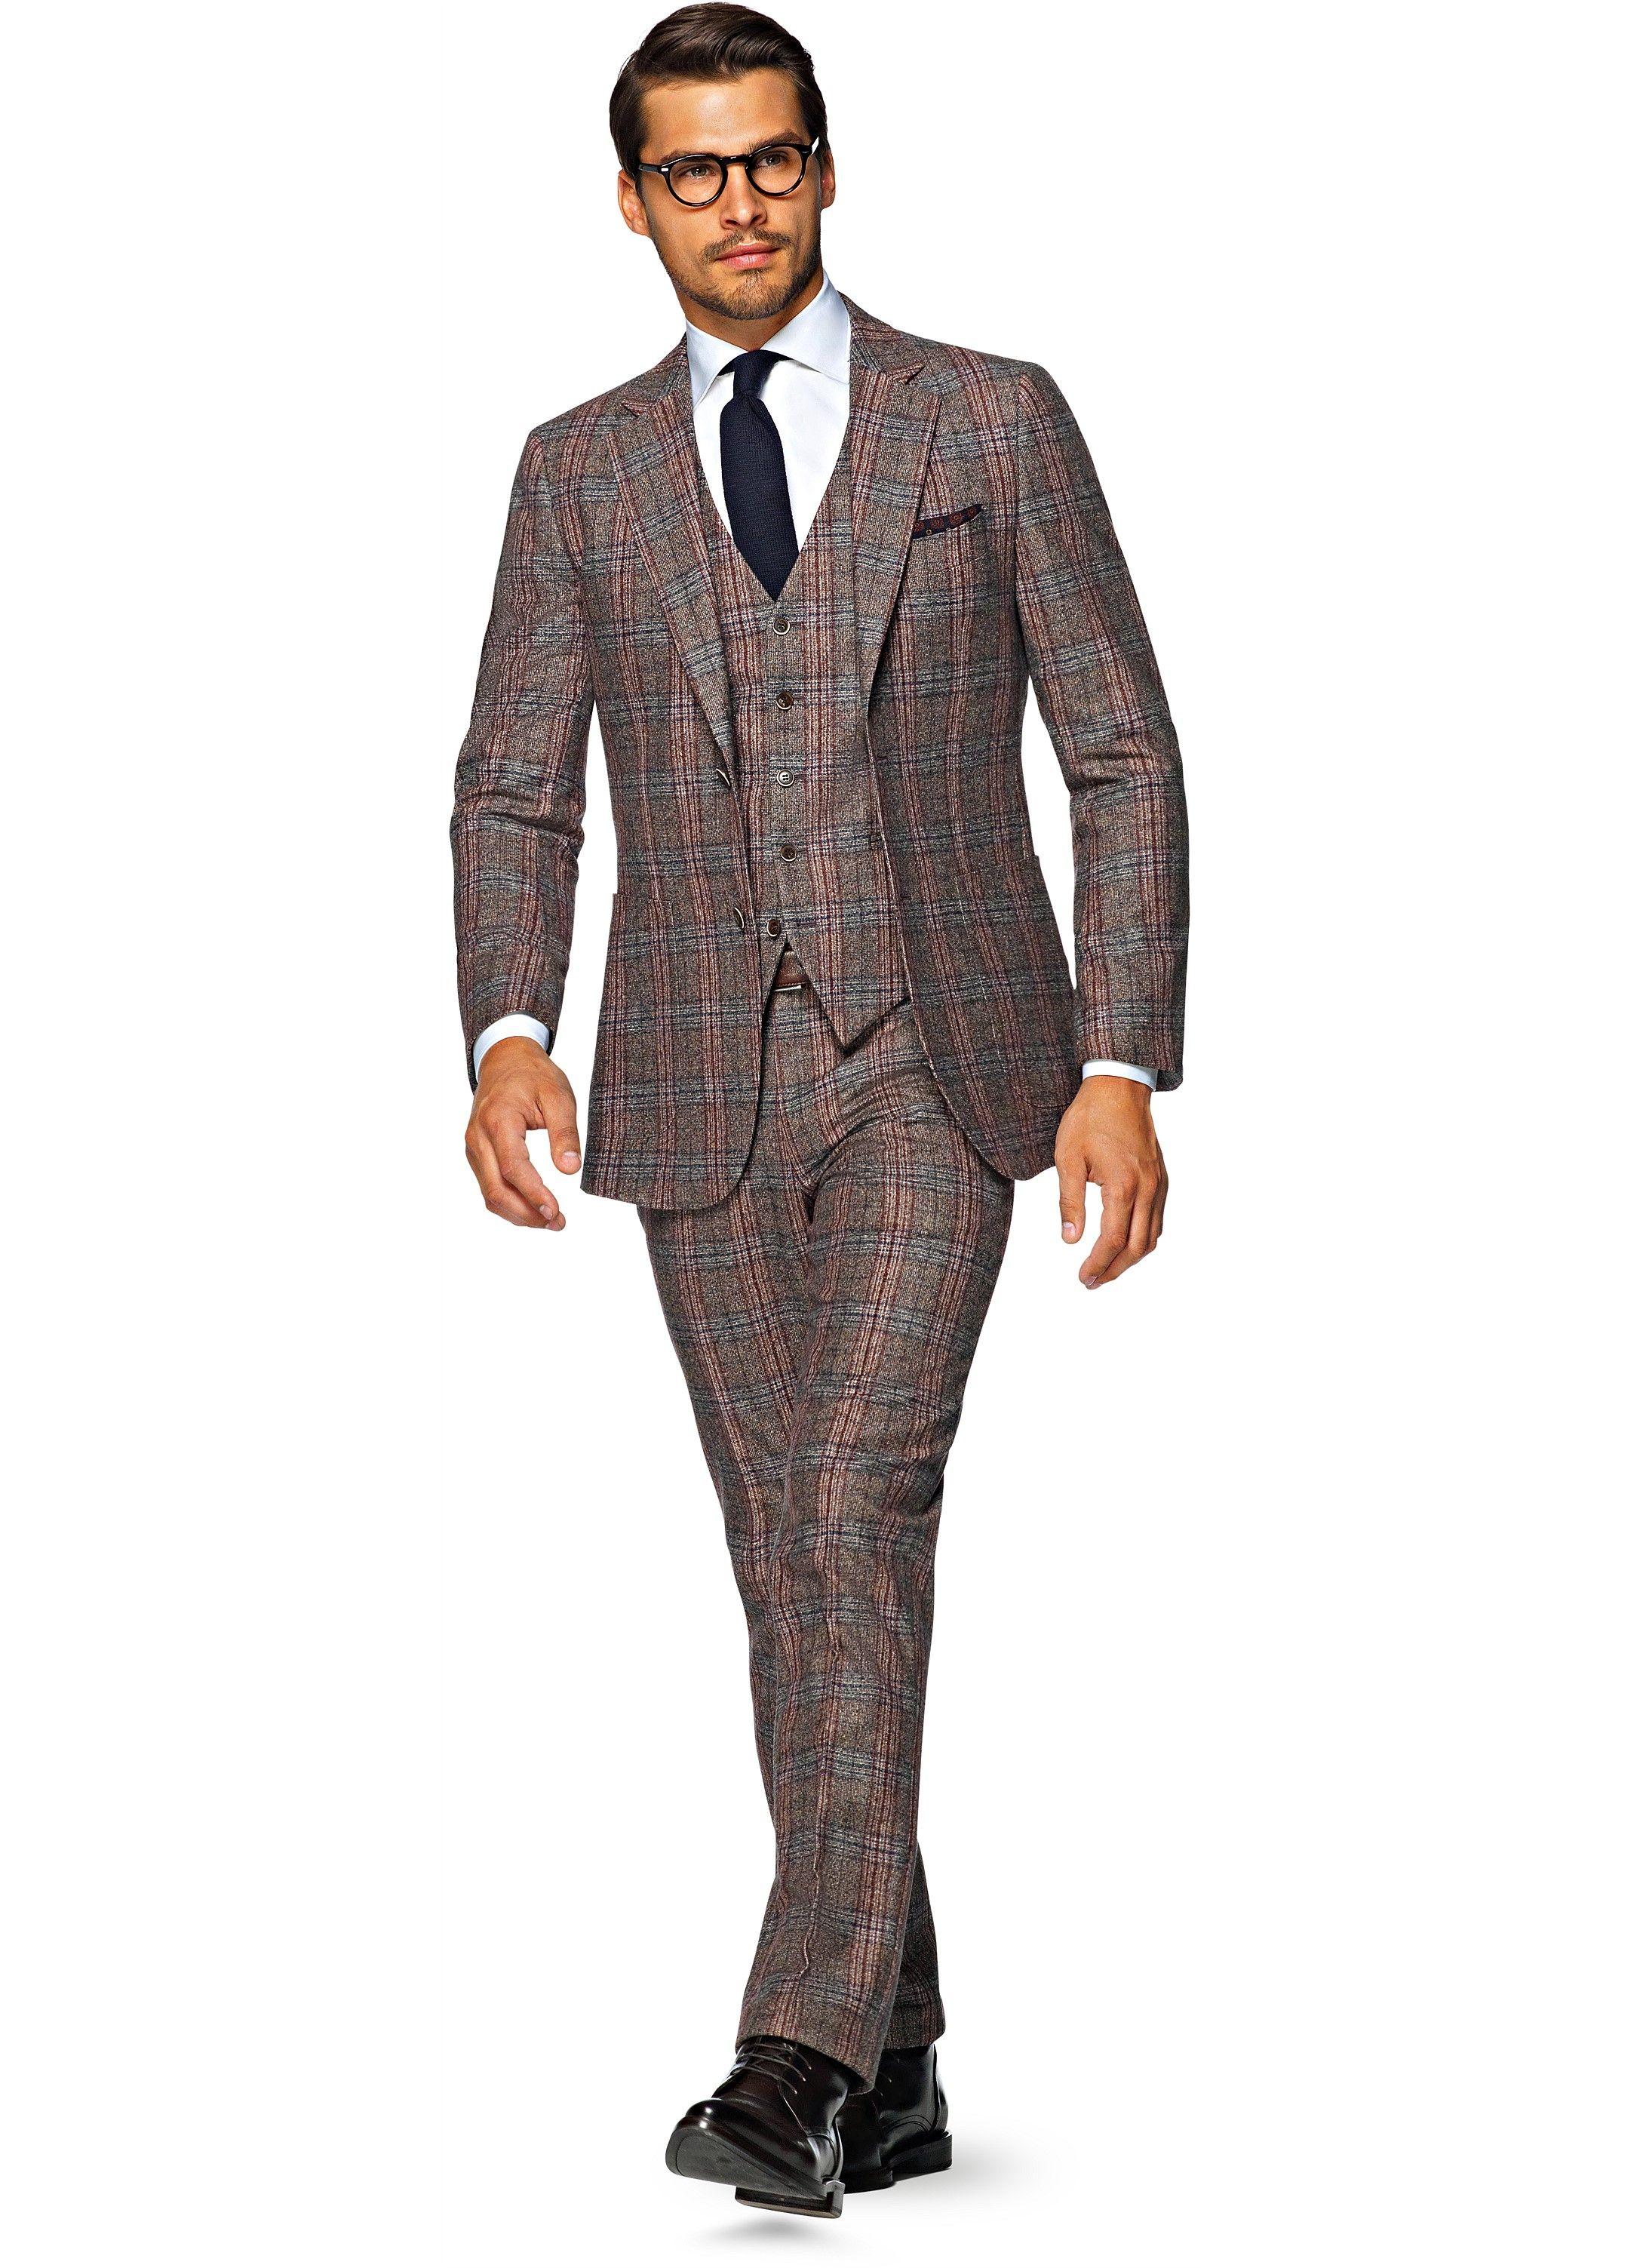 Suit Brown Check Havana P4703 Suitsupply Online Store